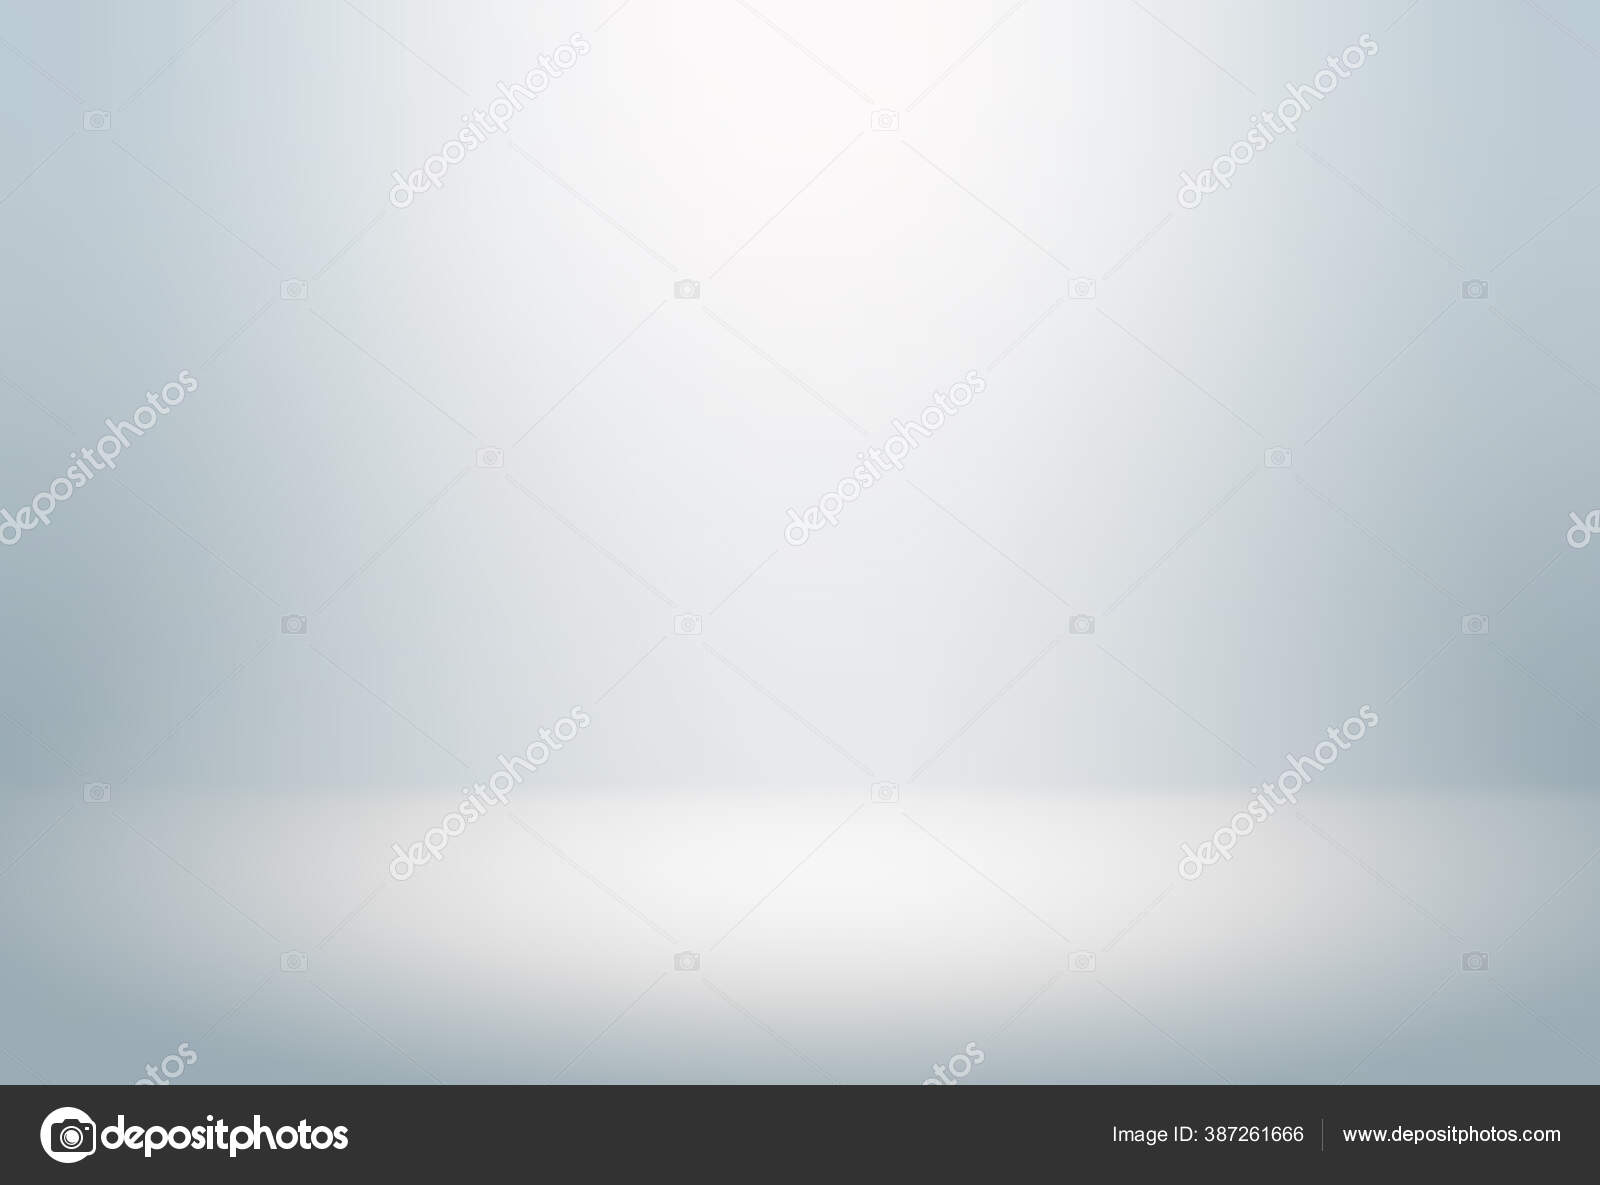 Latar Belakang Abu Abu Dan Putih Latar Belakang Perak Abstrak — Stok Vektor  © Yazada #387261666